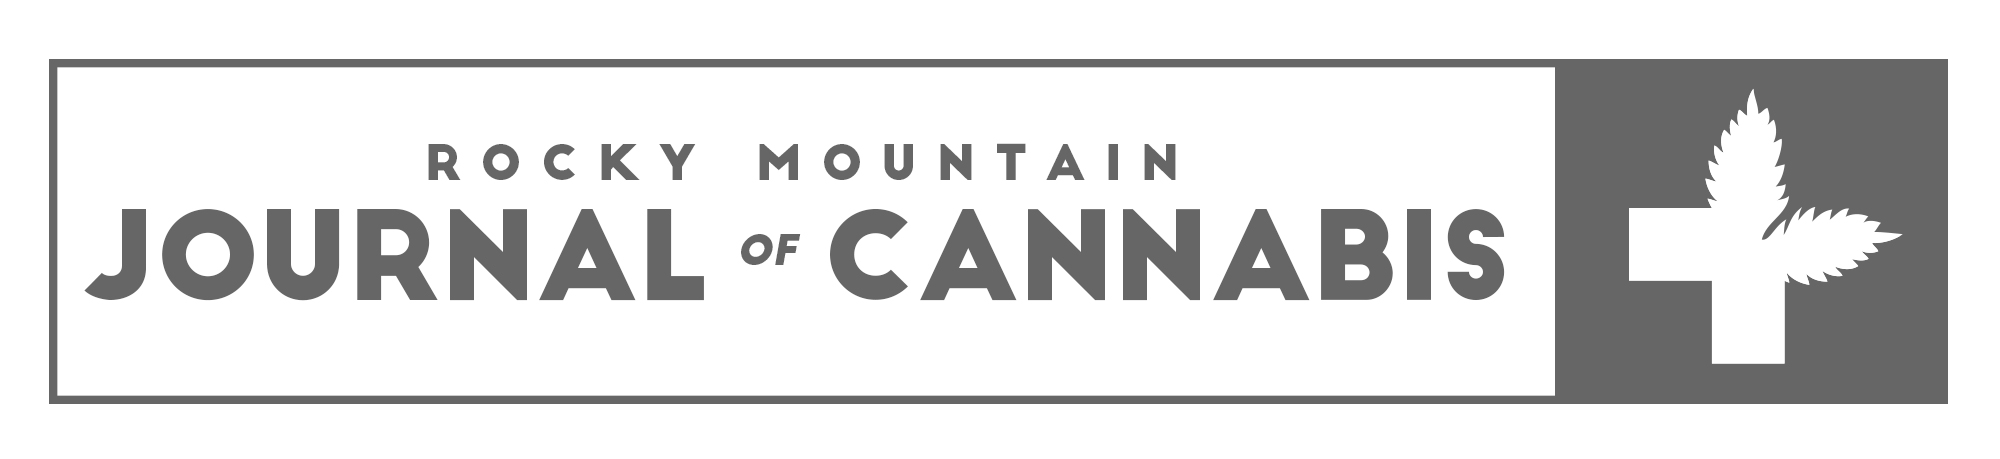 Rocky Mountain Journal of Cannabis